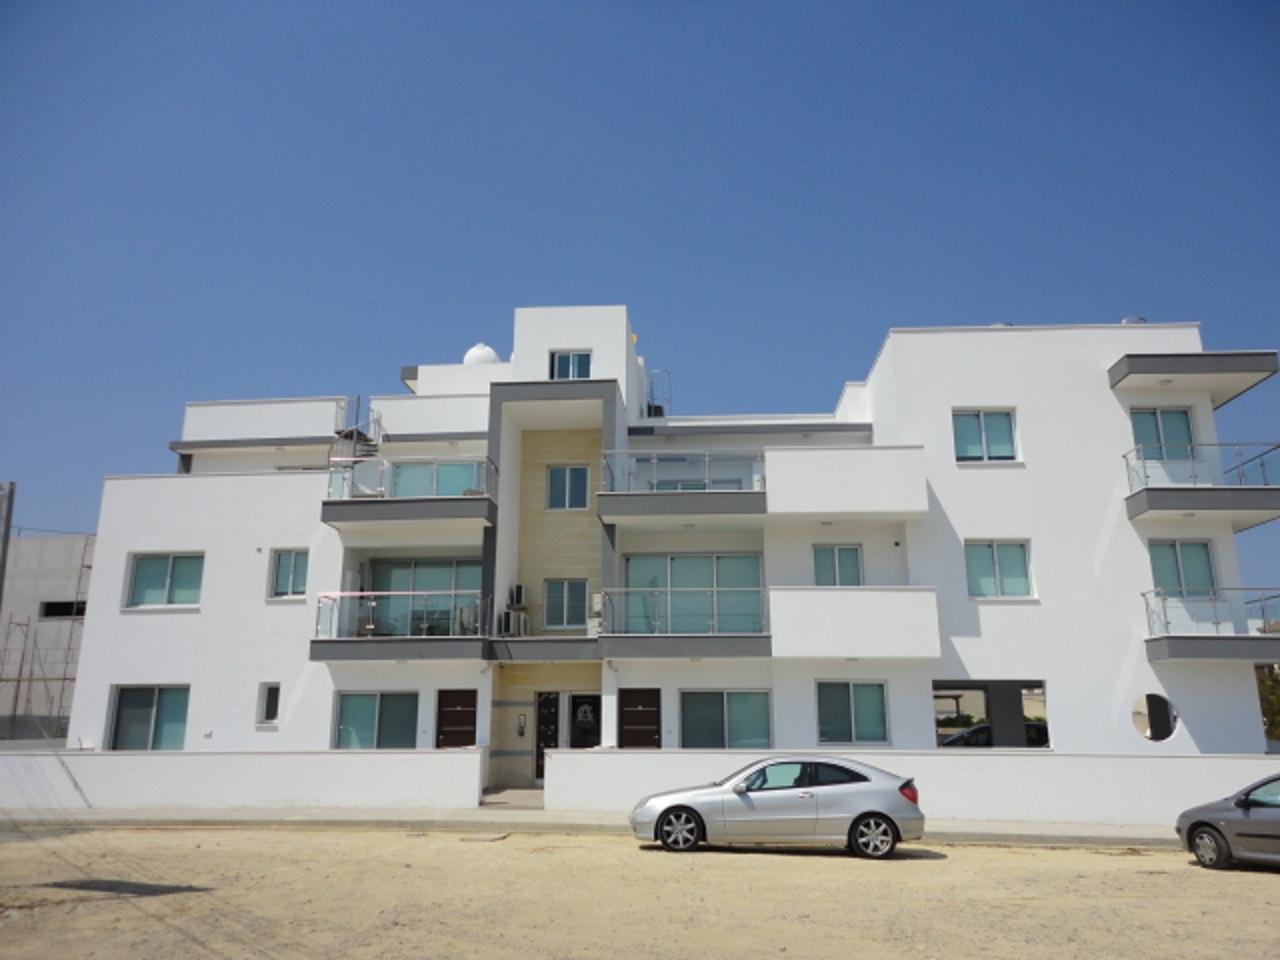 EKATERINI V – 44 Aristofanous Avenue, 2038 Strovolos, Nicosia, CYPRUS